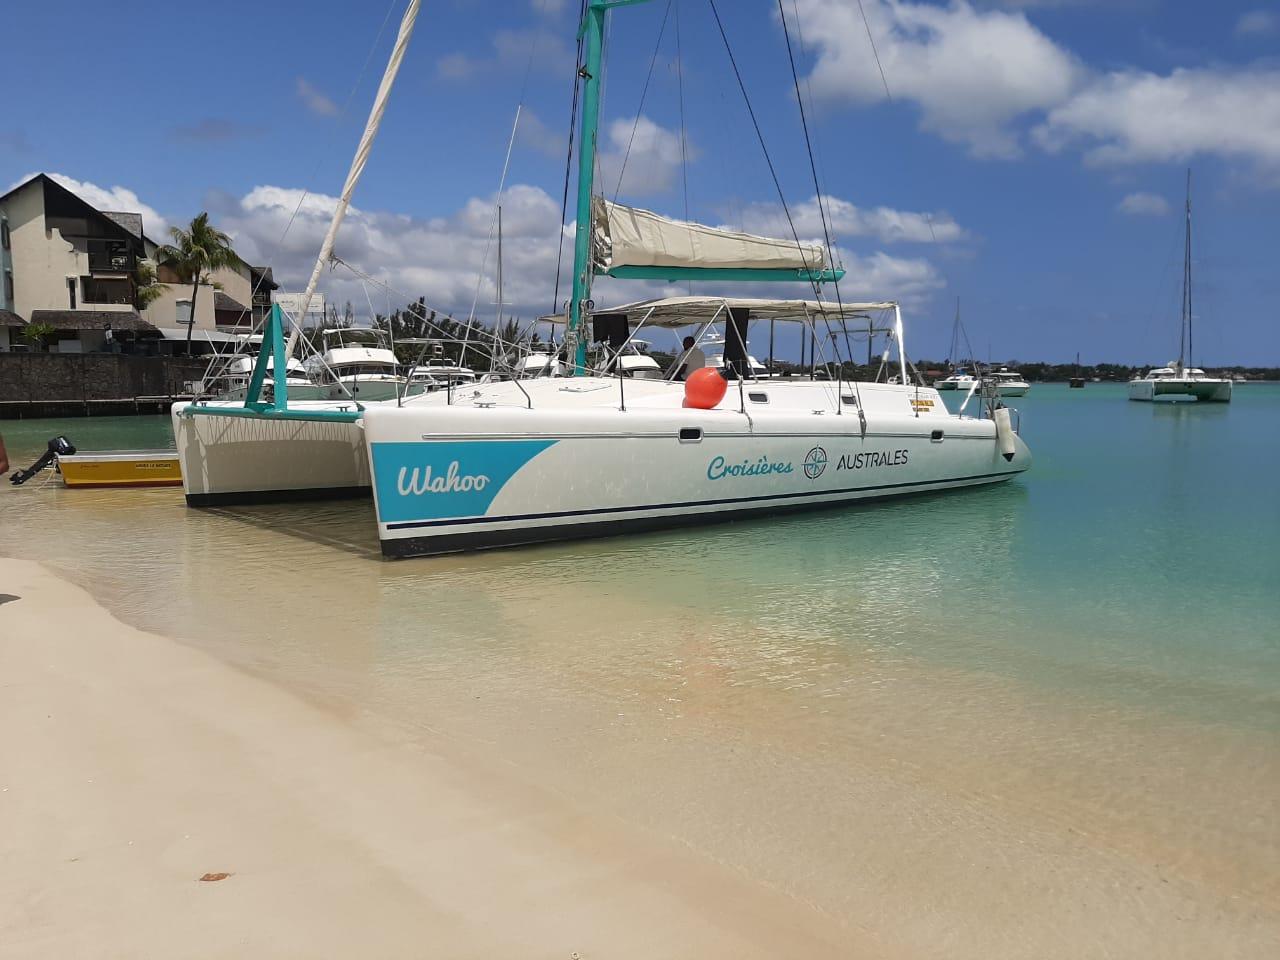 Resident Rates 2021/22 - Fun Full Day Cruise - Wahoo (Exclusivity Basis)